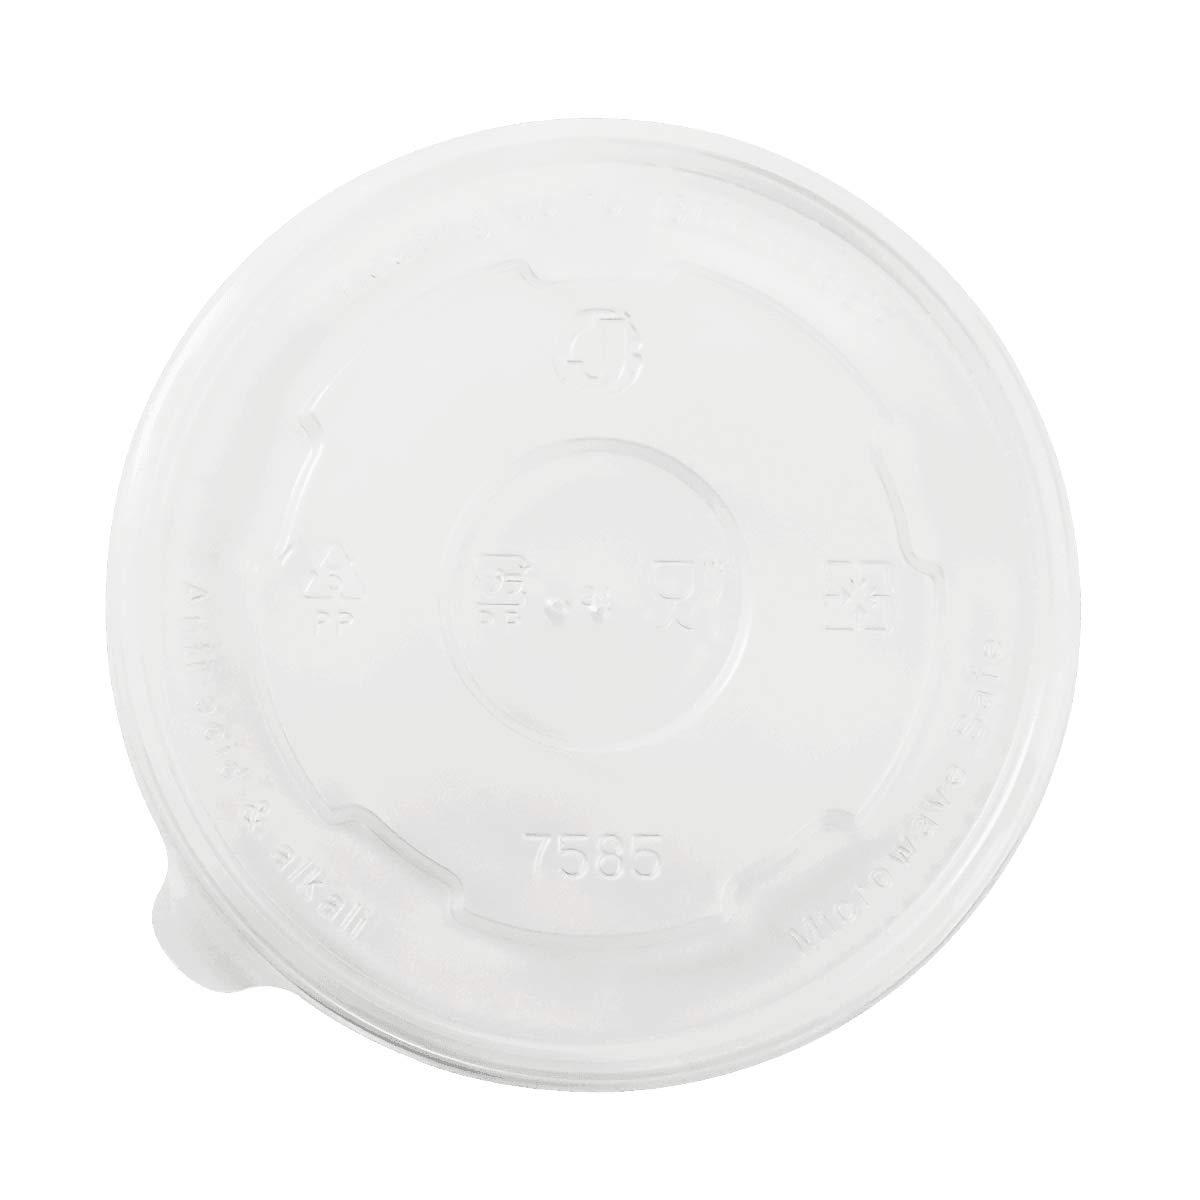 Karat C-KDL127-PP 20 oz PP Food Container Flat Lids (Case of 600)